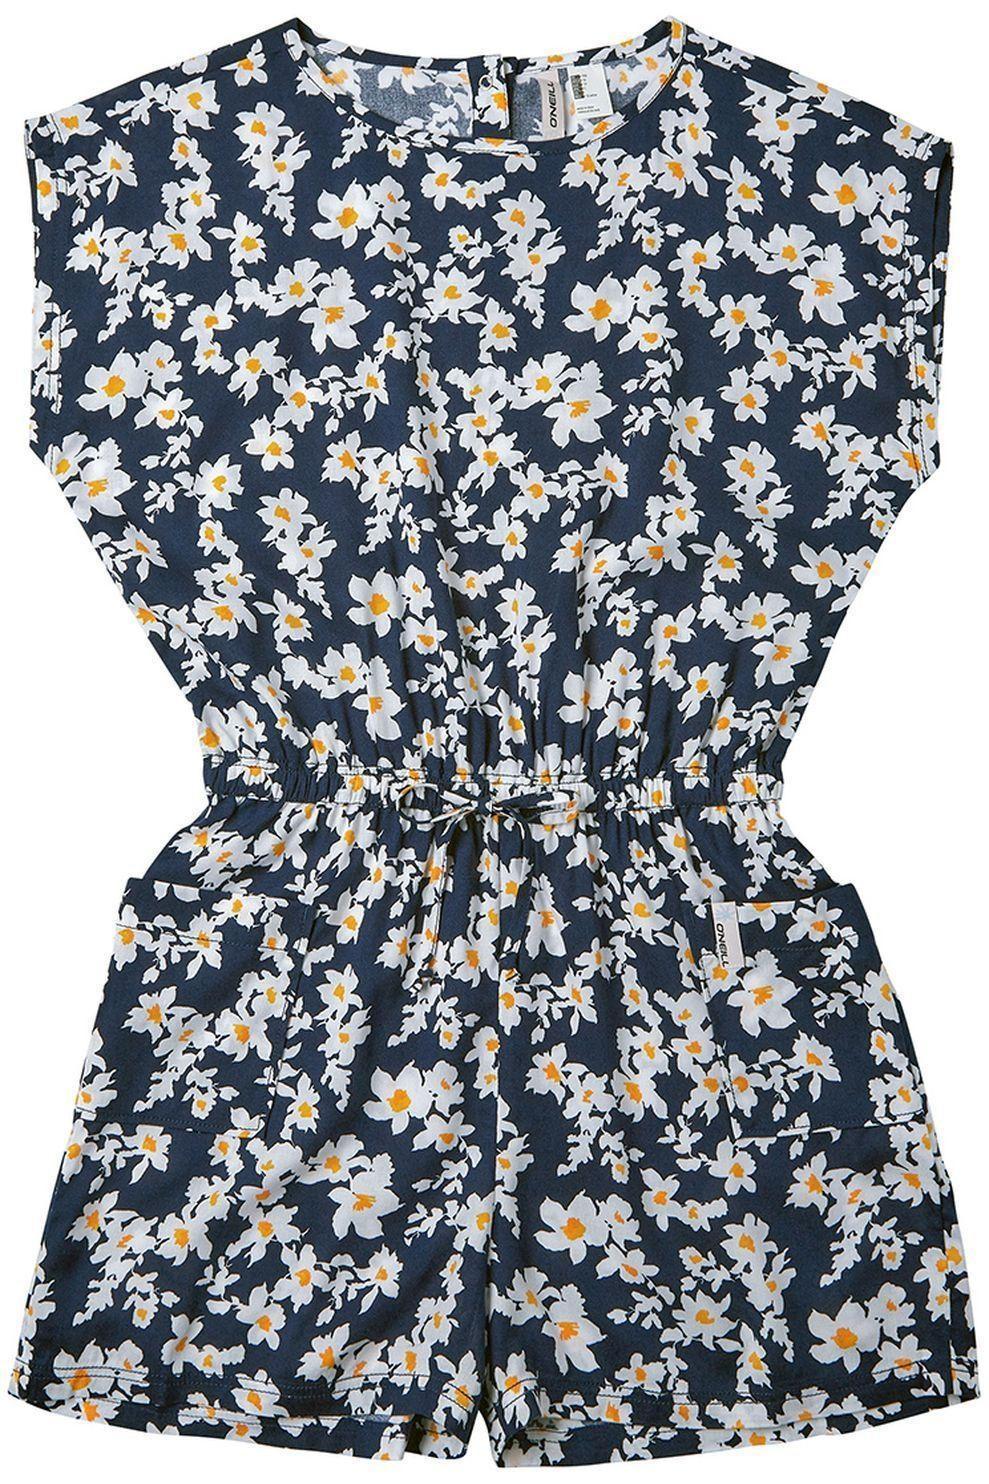 O'Neill Jumpsuit Lg O'Neill Print voor meisjes - Blauw - Maten: 140, 152, 164, 176